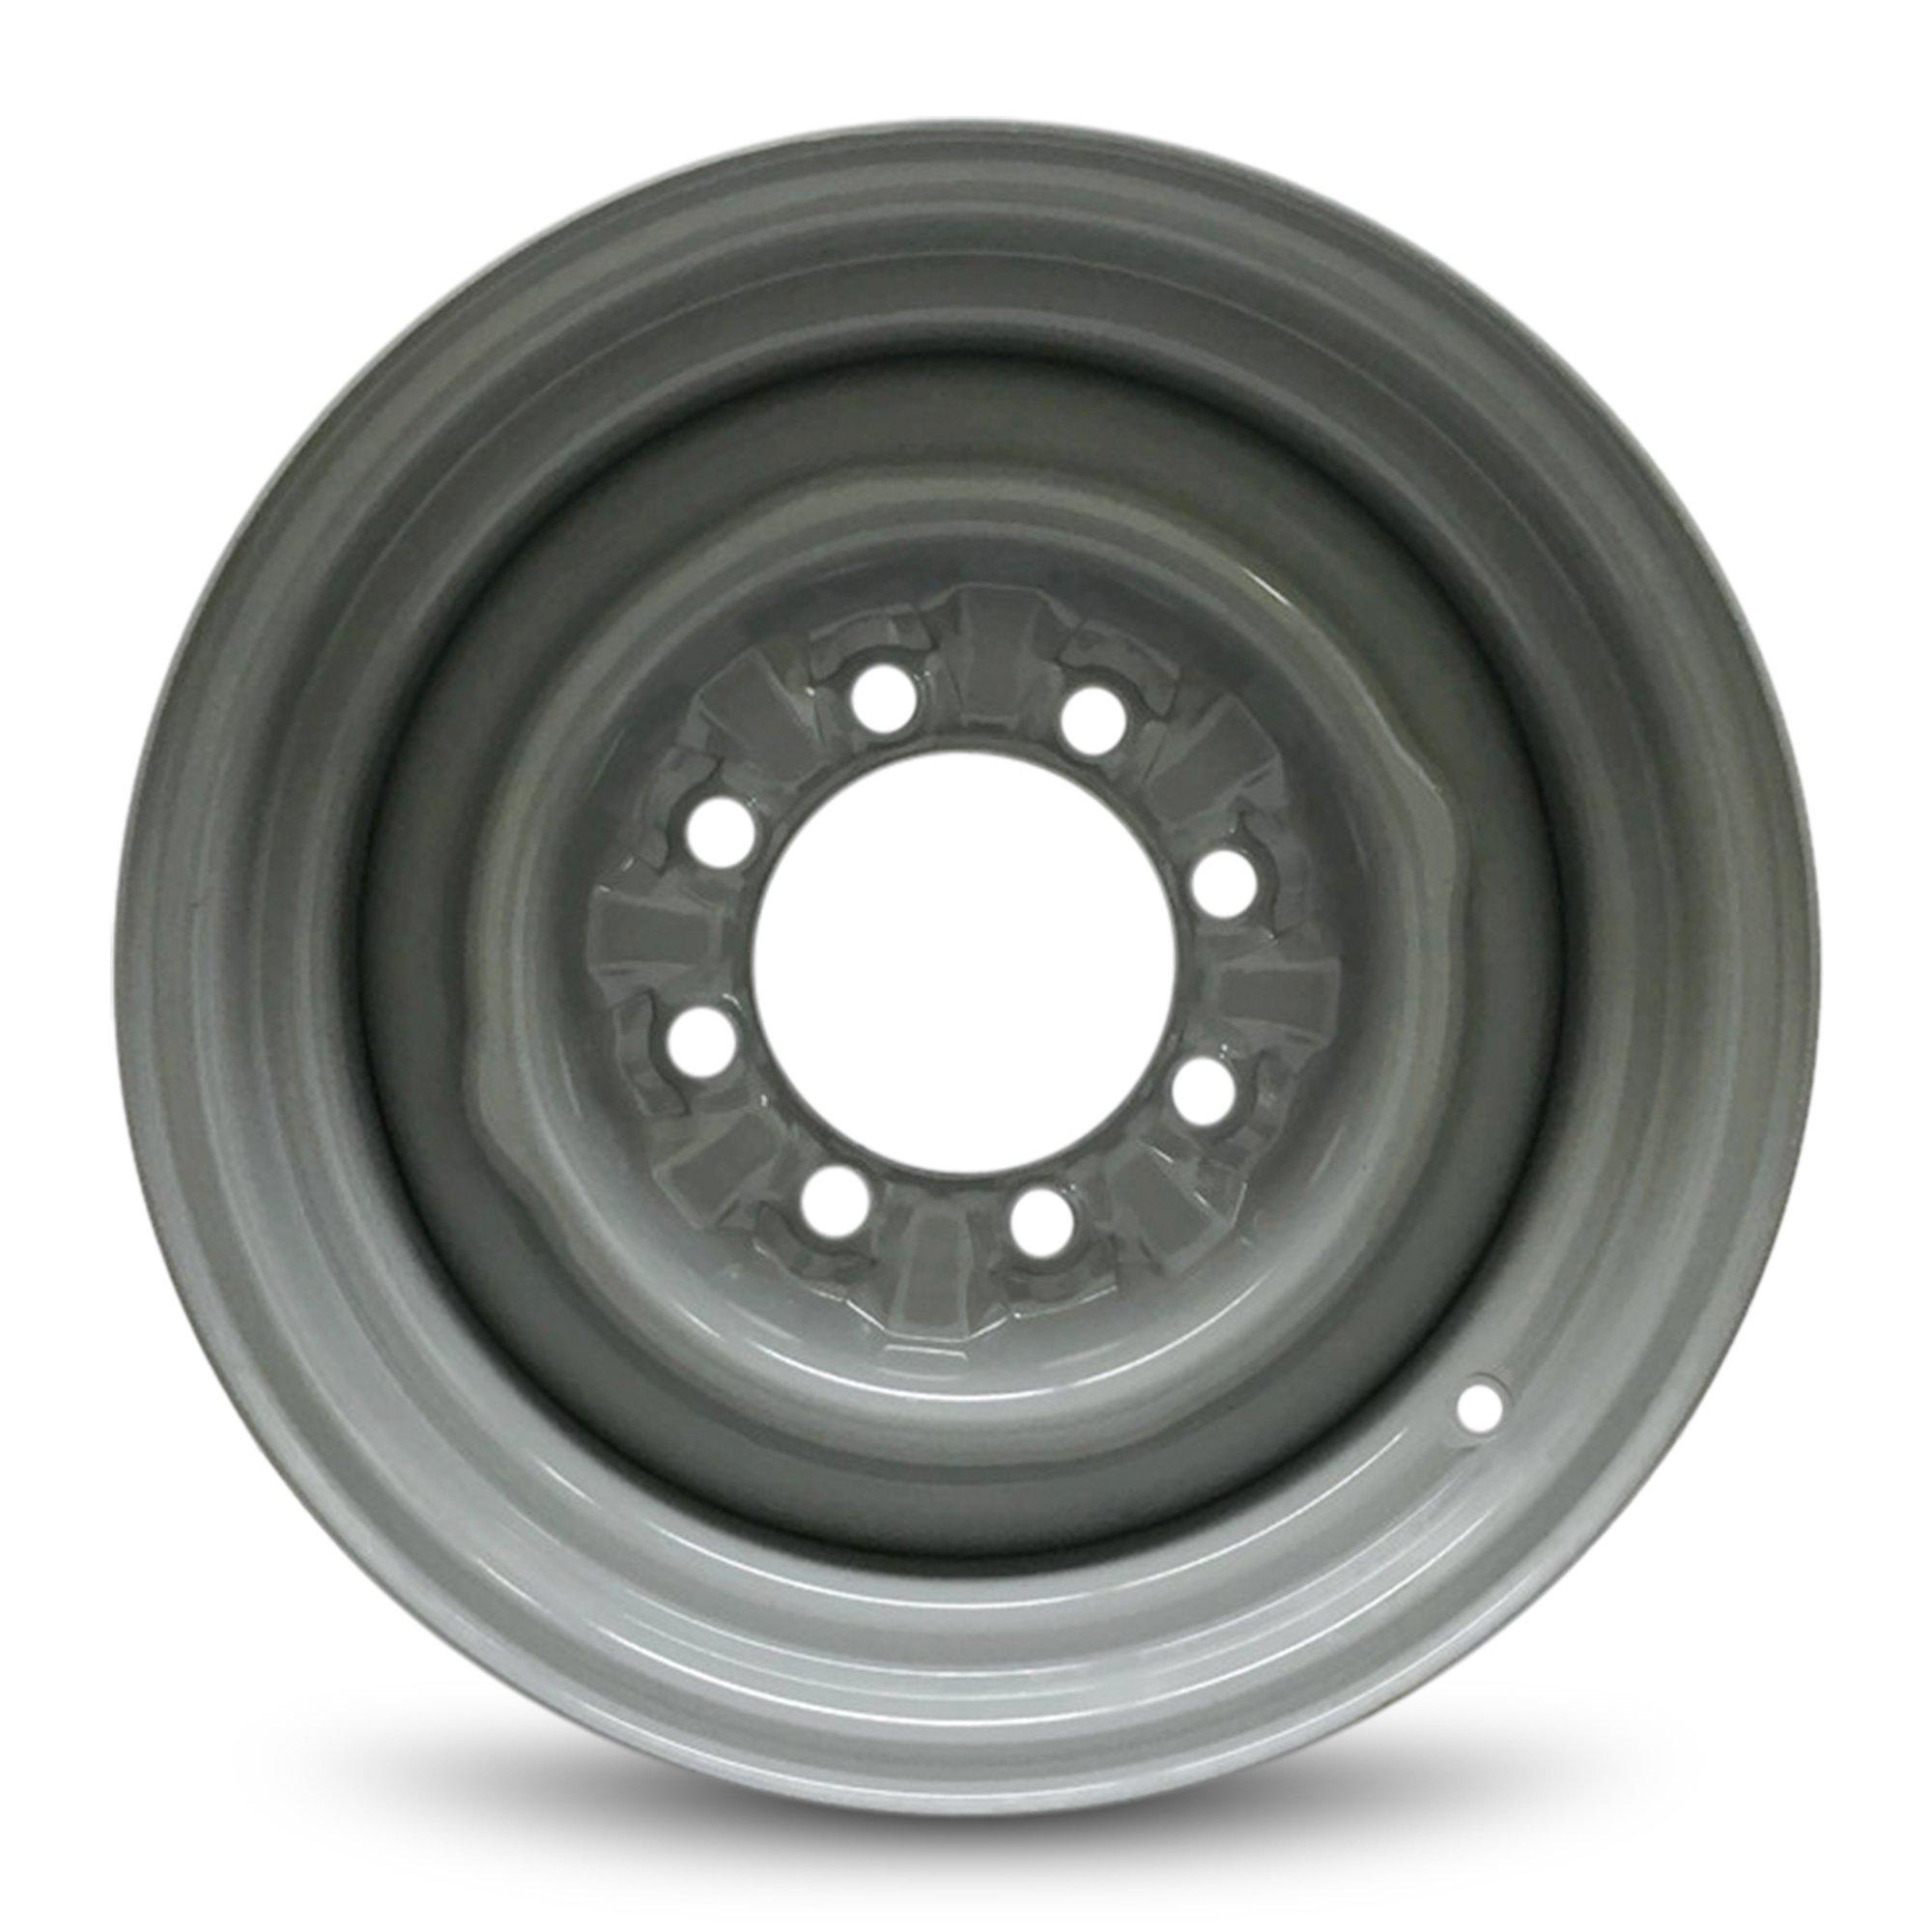 Ford E150 F150 E250 F250 E350 F350 16'' 8 Lug Steel Wheel/16x7 Inch Steel Rim SRW